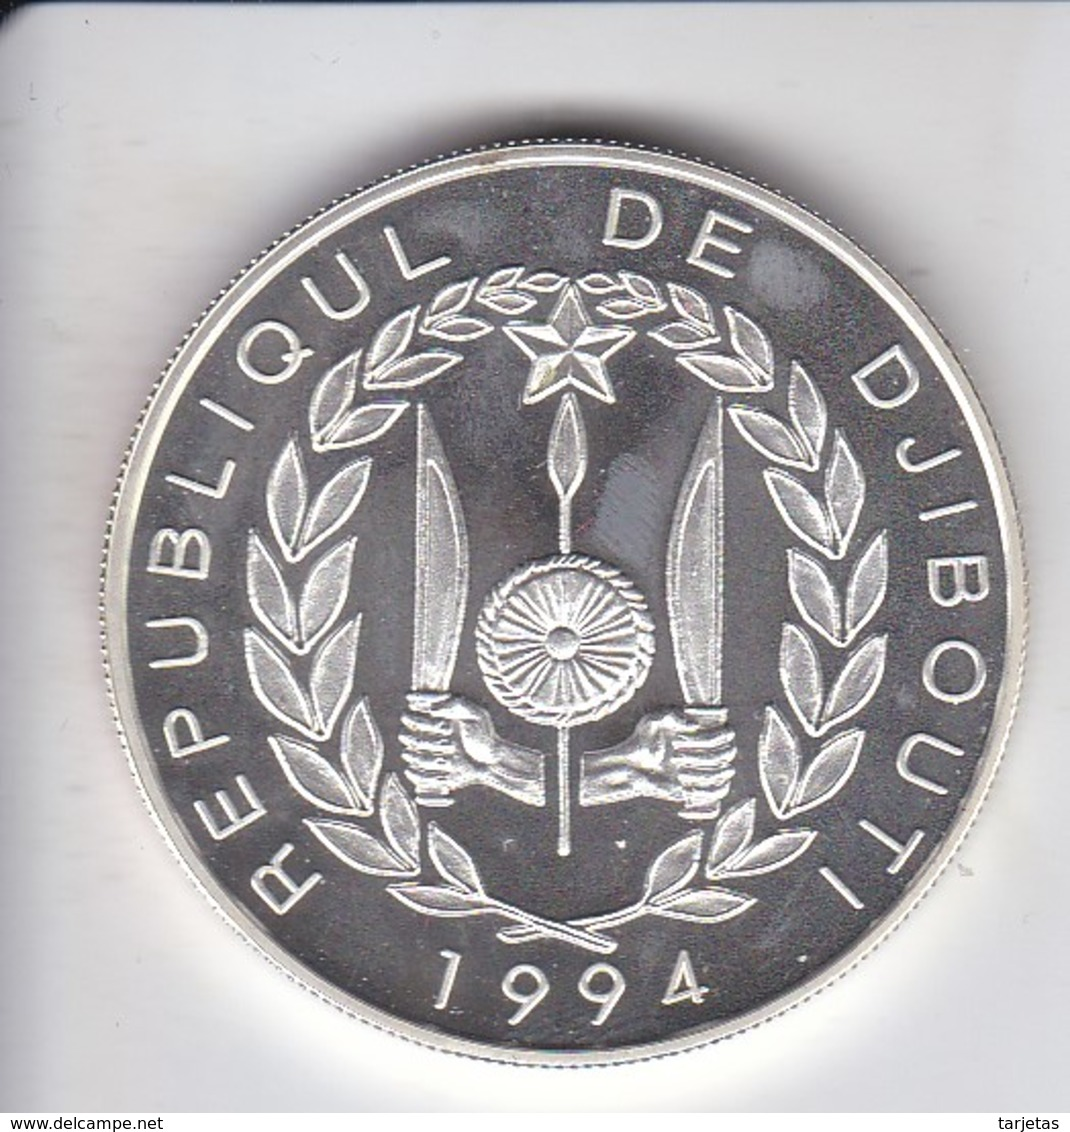 MONEDA DE PLATA DE DJIBOUTI DE 100 FRANCS DEL AÑO 1994 OLYMPIC GAMES 1996 (SILVER-ARGENT) - Djibouti